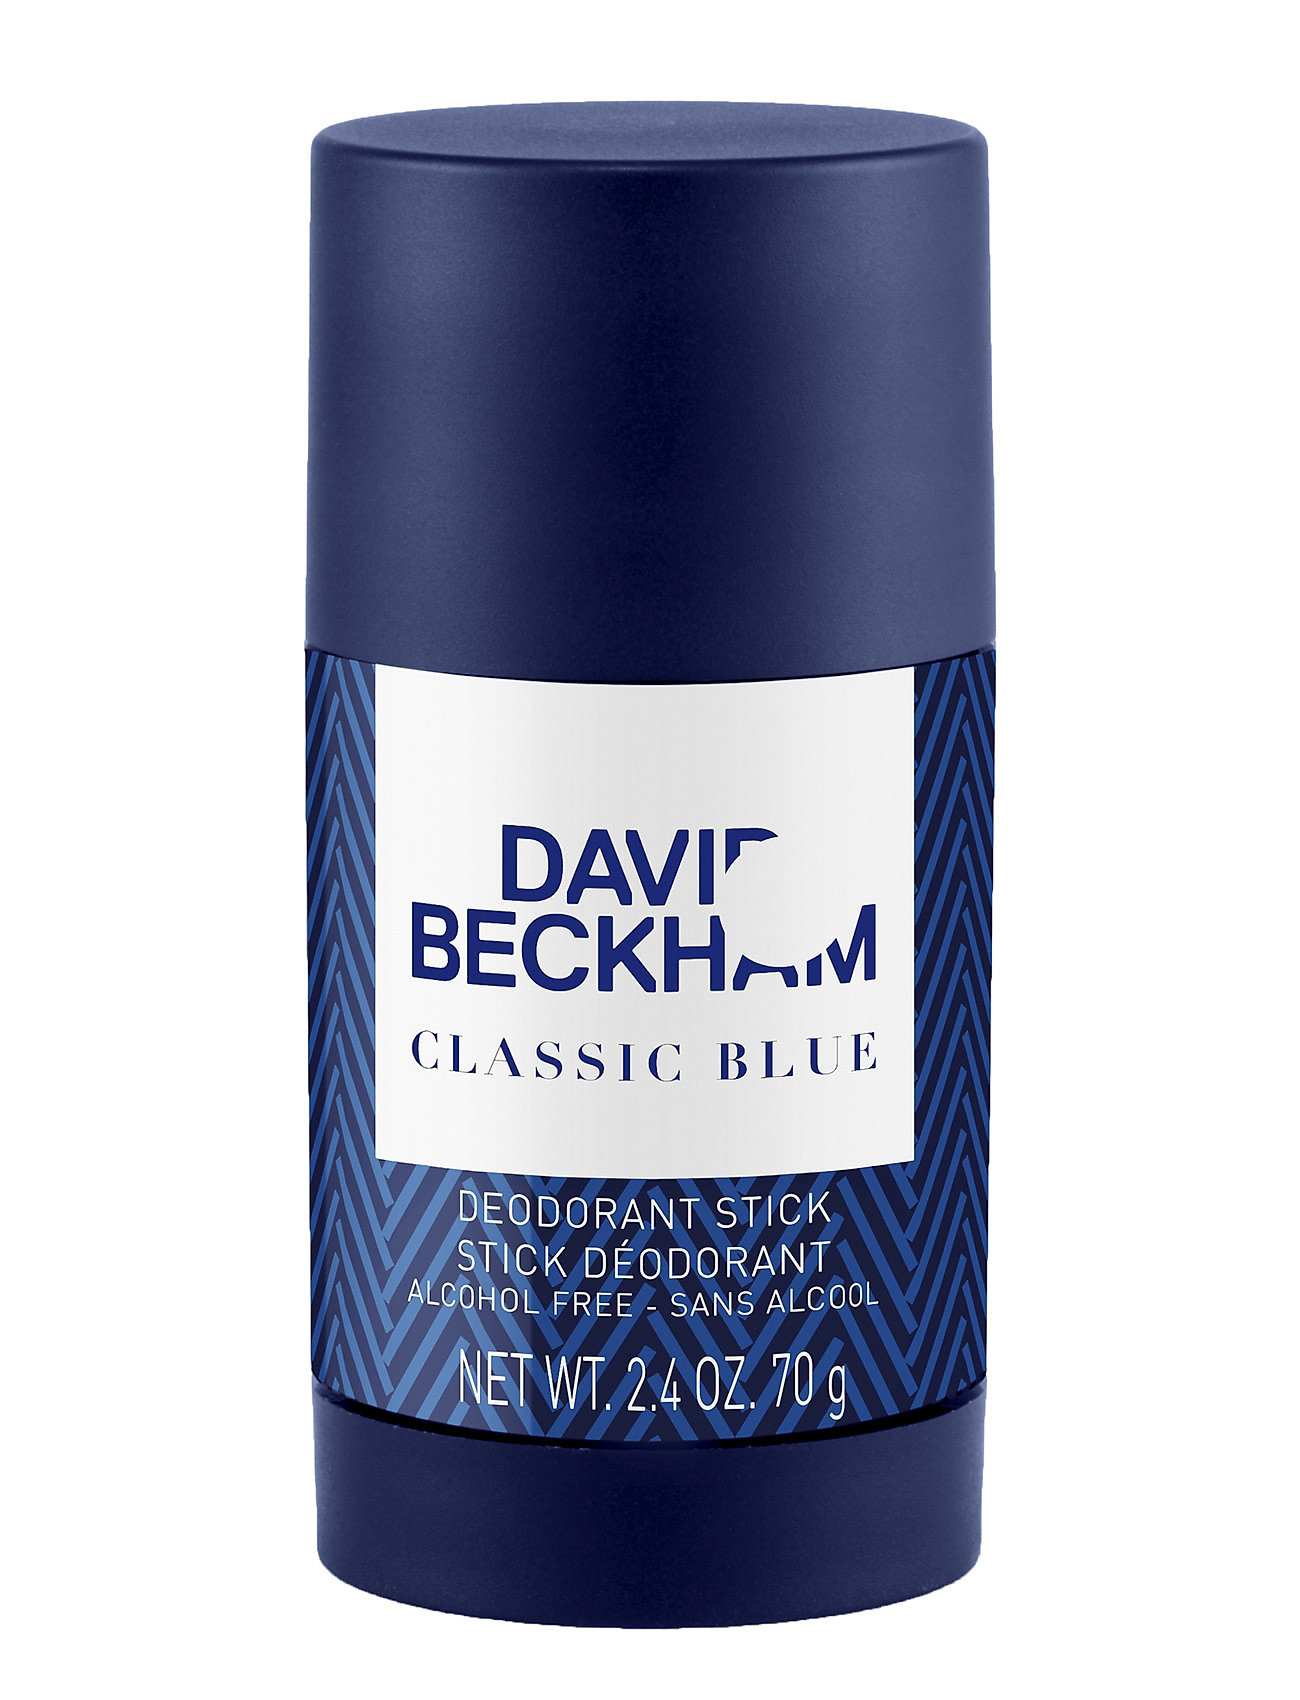 david beckham David beckham classic blue deodoran fra boozt.com dk